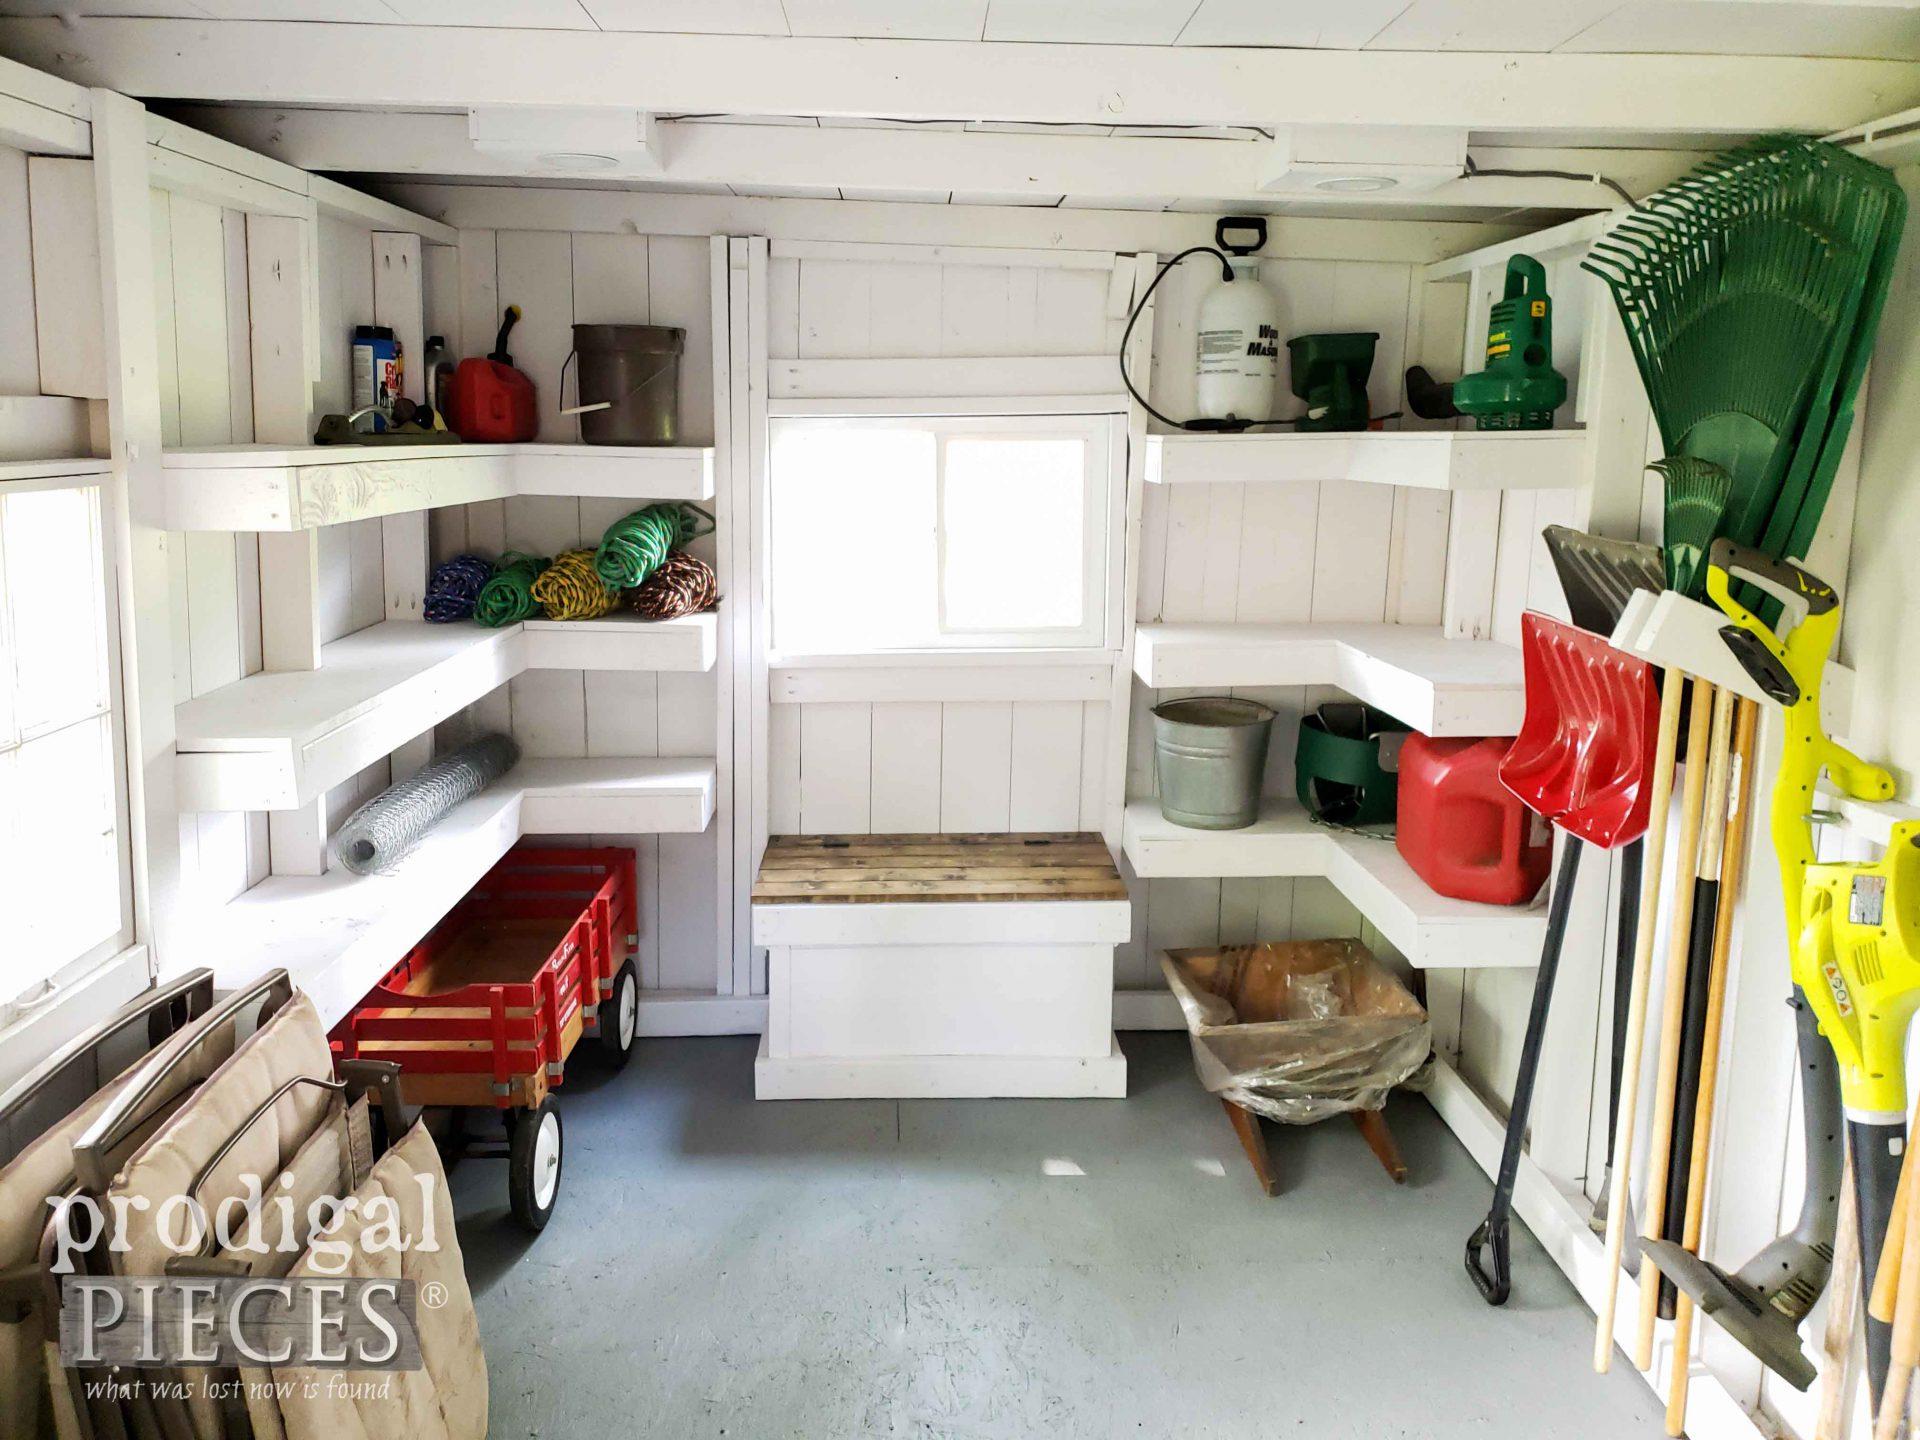 DIY Garden Shed Remodel with Custom Storage by Prodigal Pieces | prodigalpieces.com #prodigalpieces #diy #garden #storage